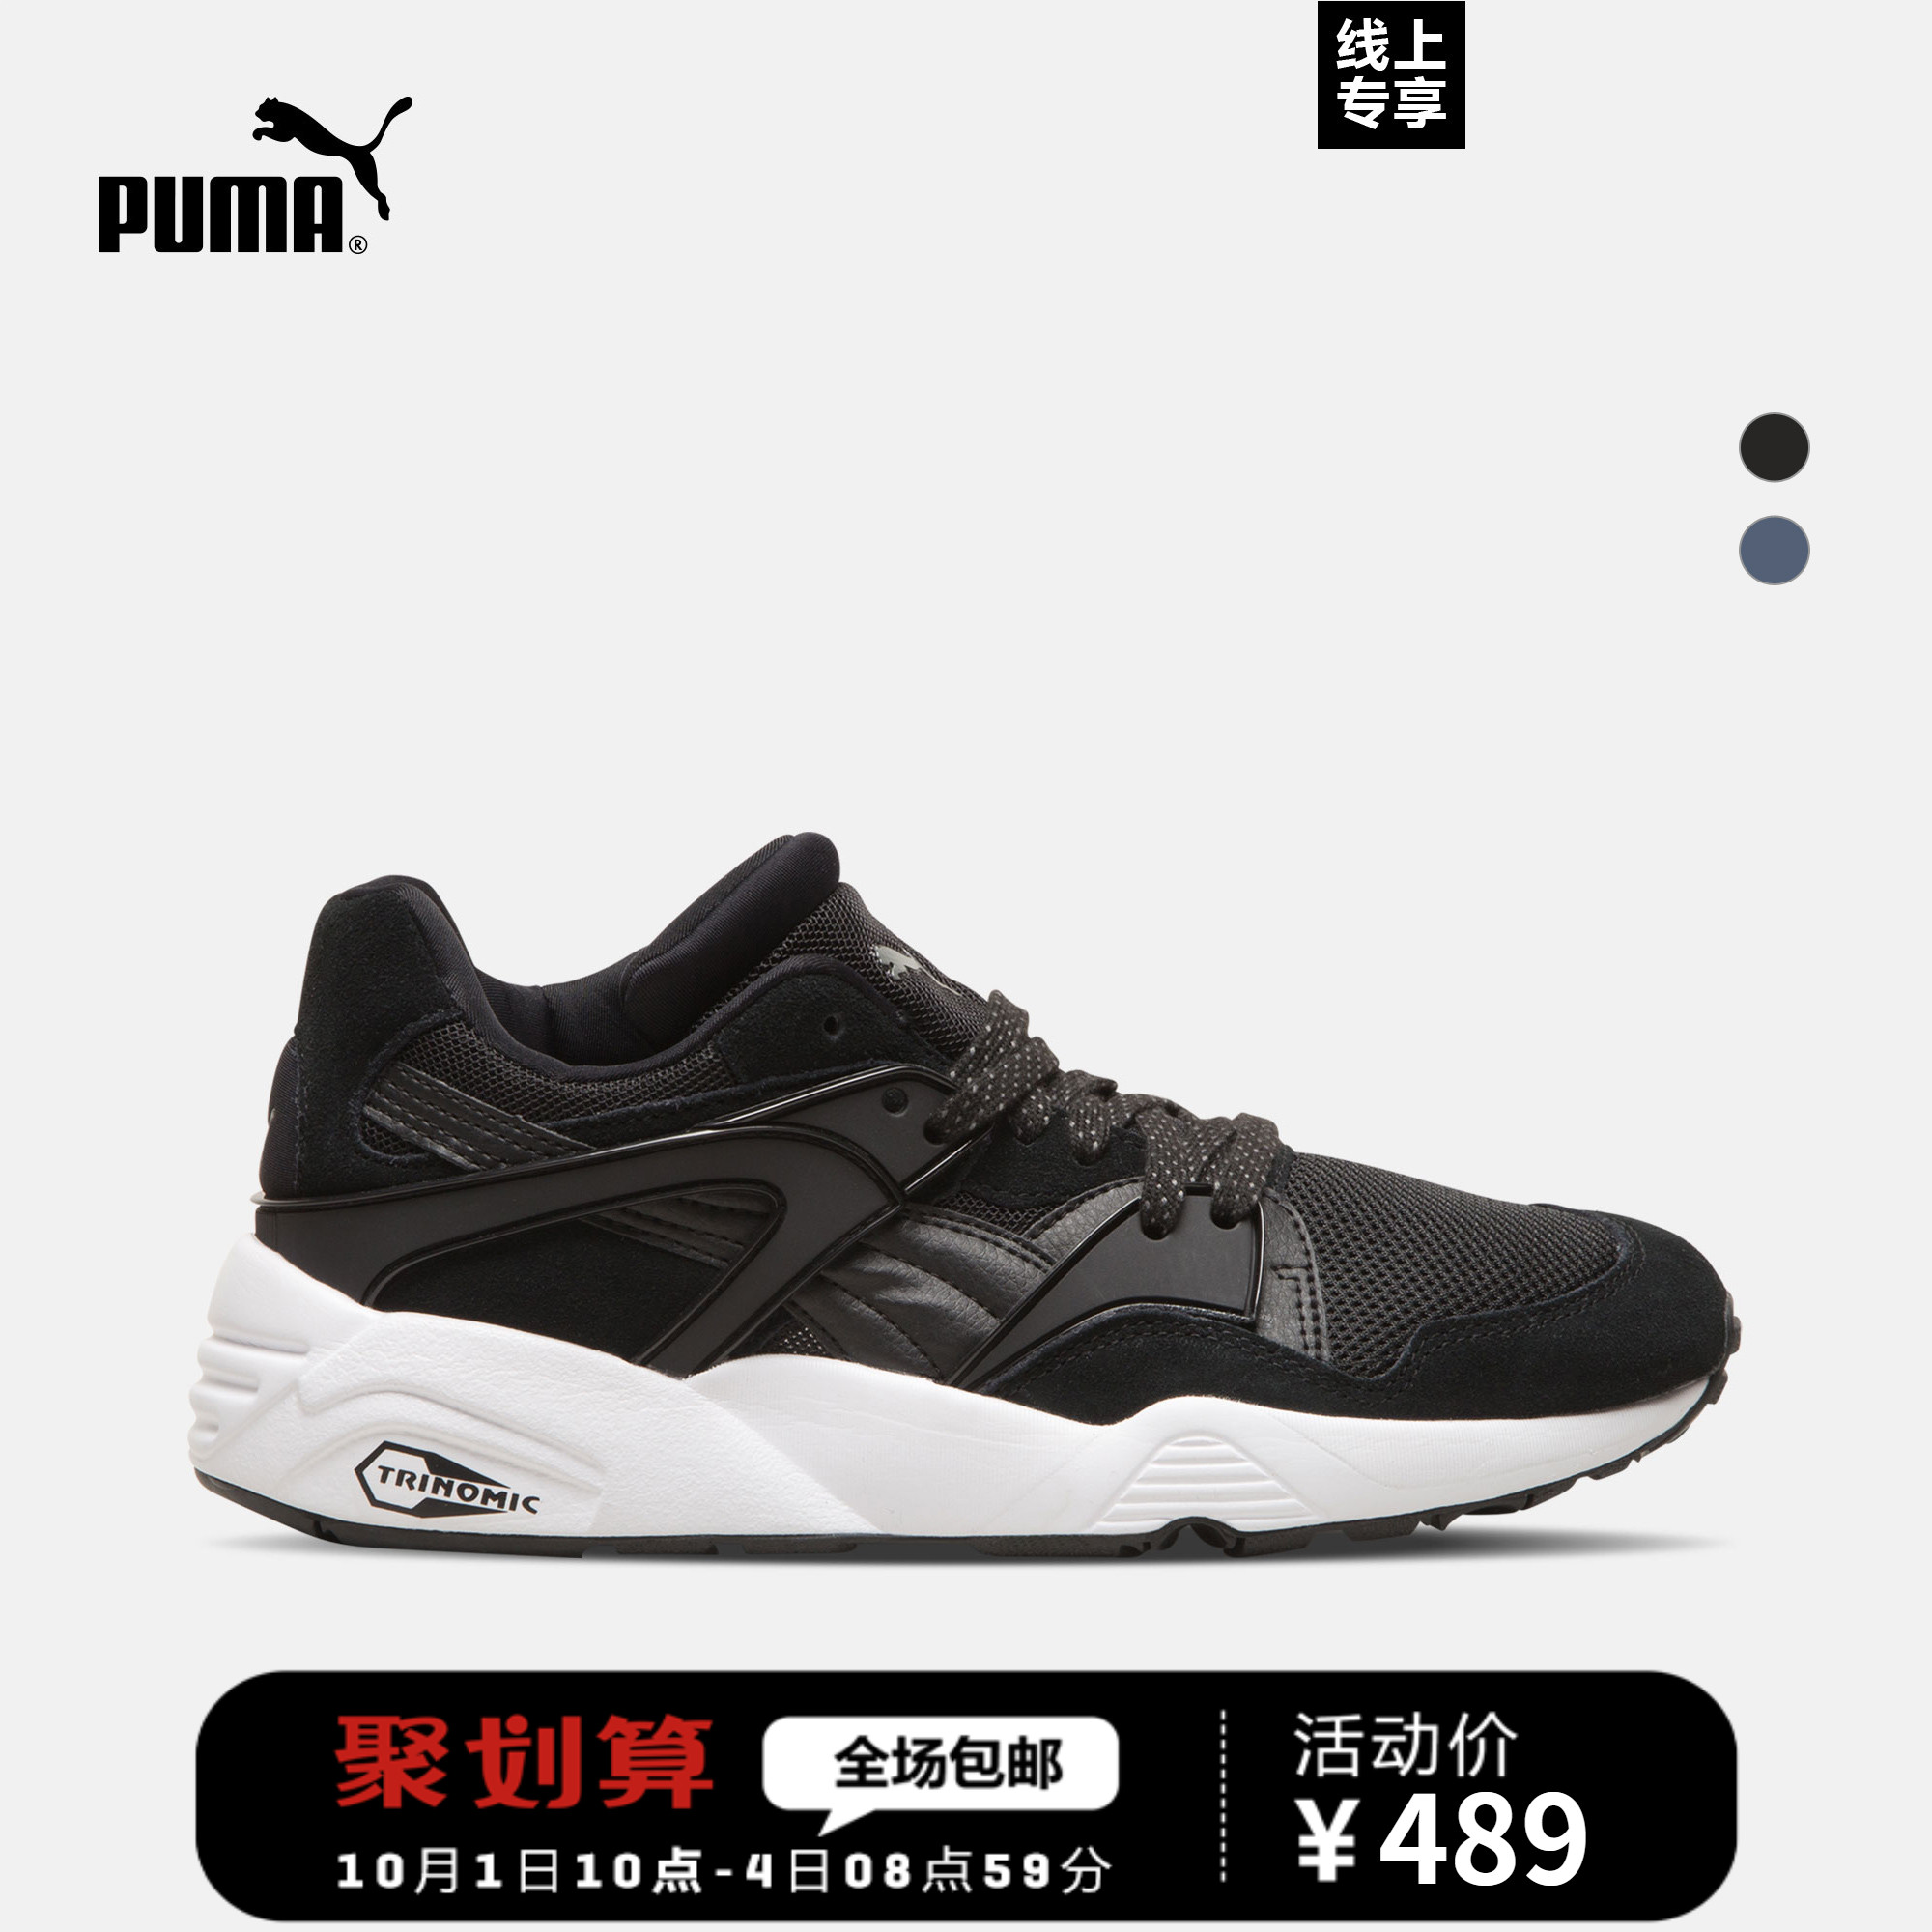 PUMA彪马官方 男女同款休闲鞋 BLAZE 365516